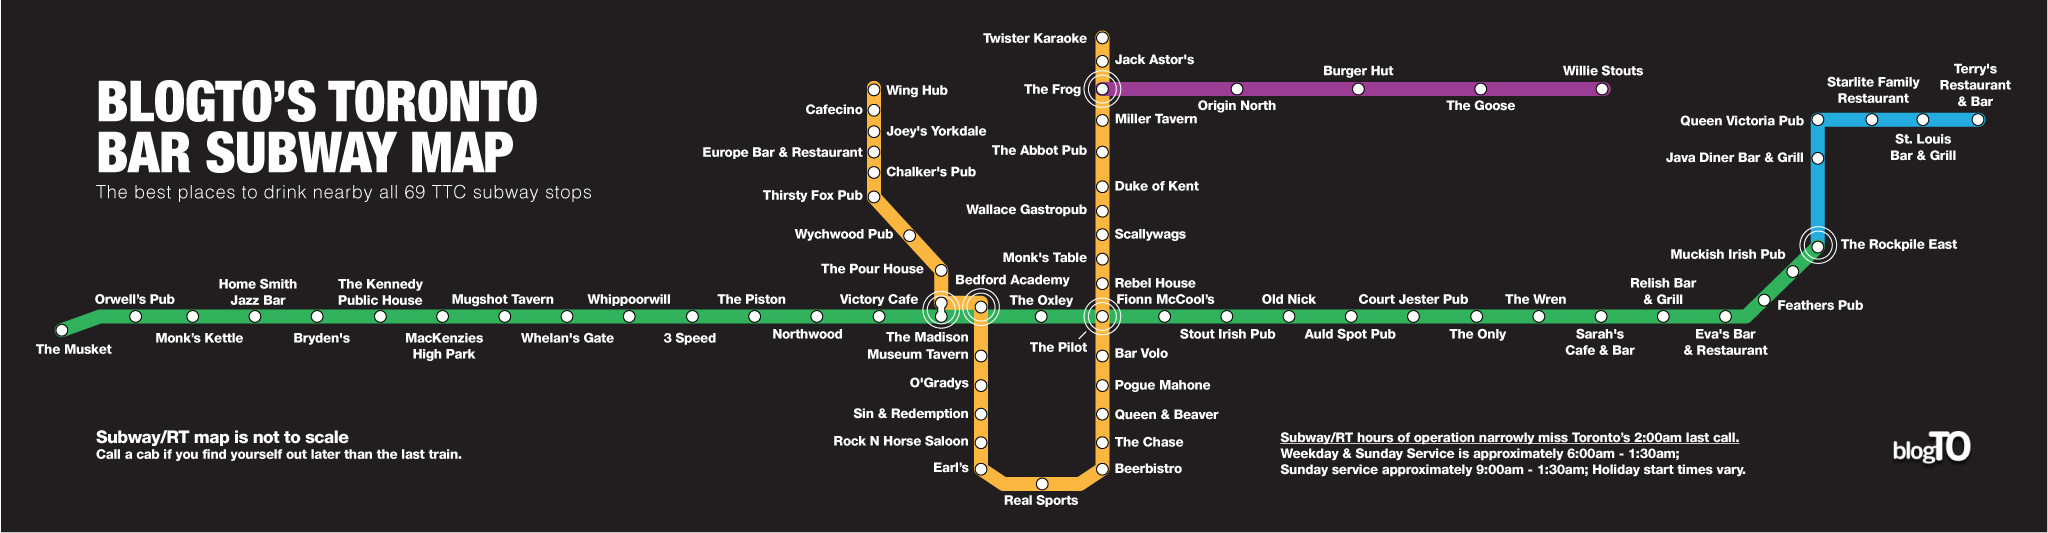 Ttc Subway Map Vs Actual.Mapofmap1 Sayfa 36